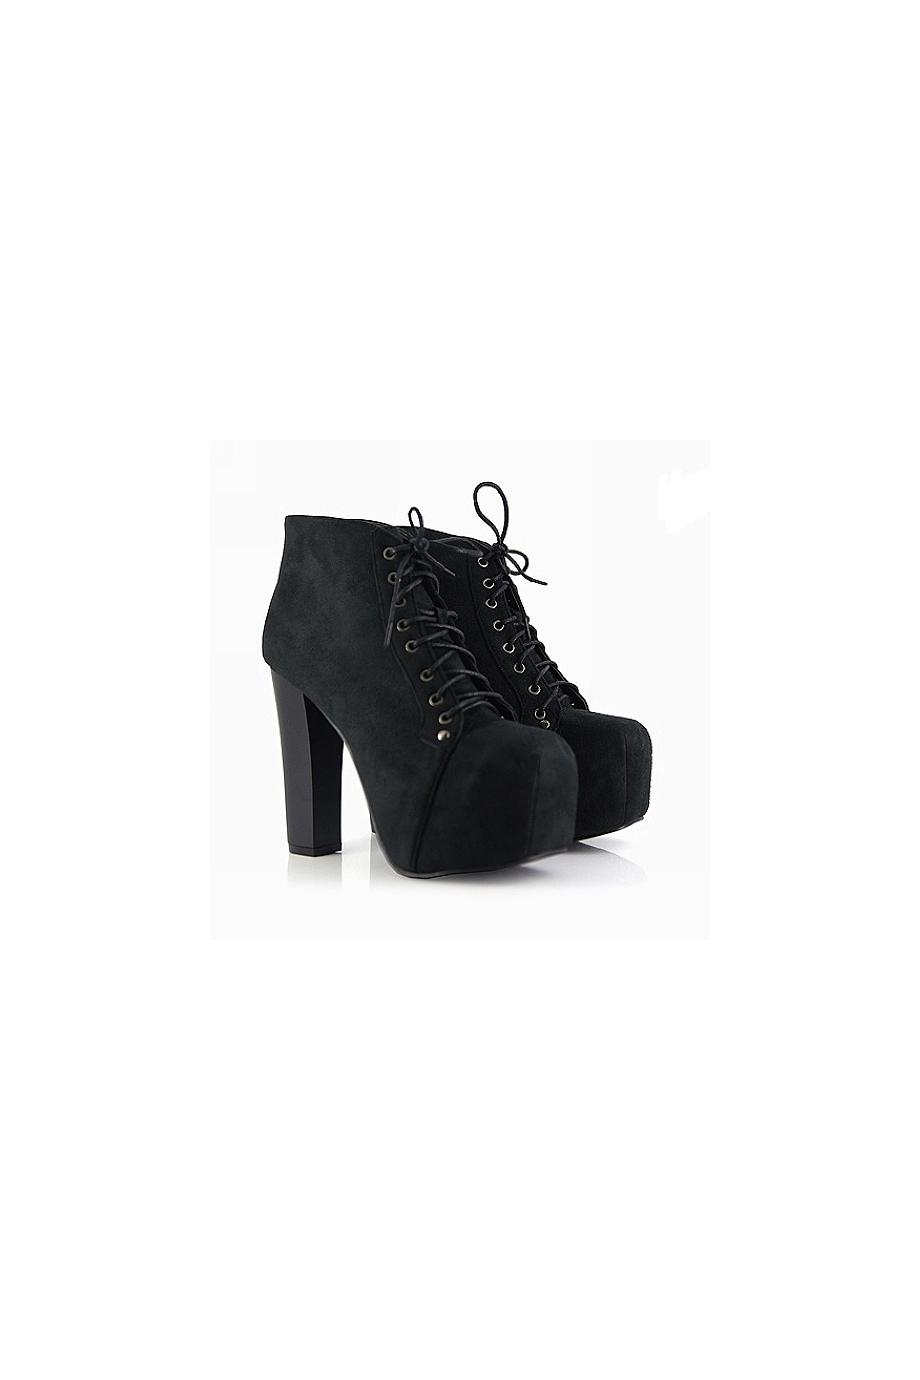 ZENA Black Platform Ankle Boots Shop Jeffrey Campbell Lita Inspired Platform Boots | Online Store Black Platform Ankle Boots | Runway Shoes - Jessica Buurman [125] - $99.00 : JESSICABUURMAN.COM